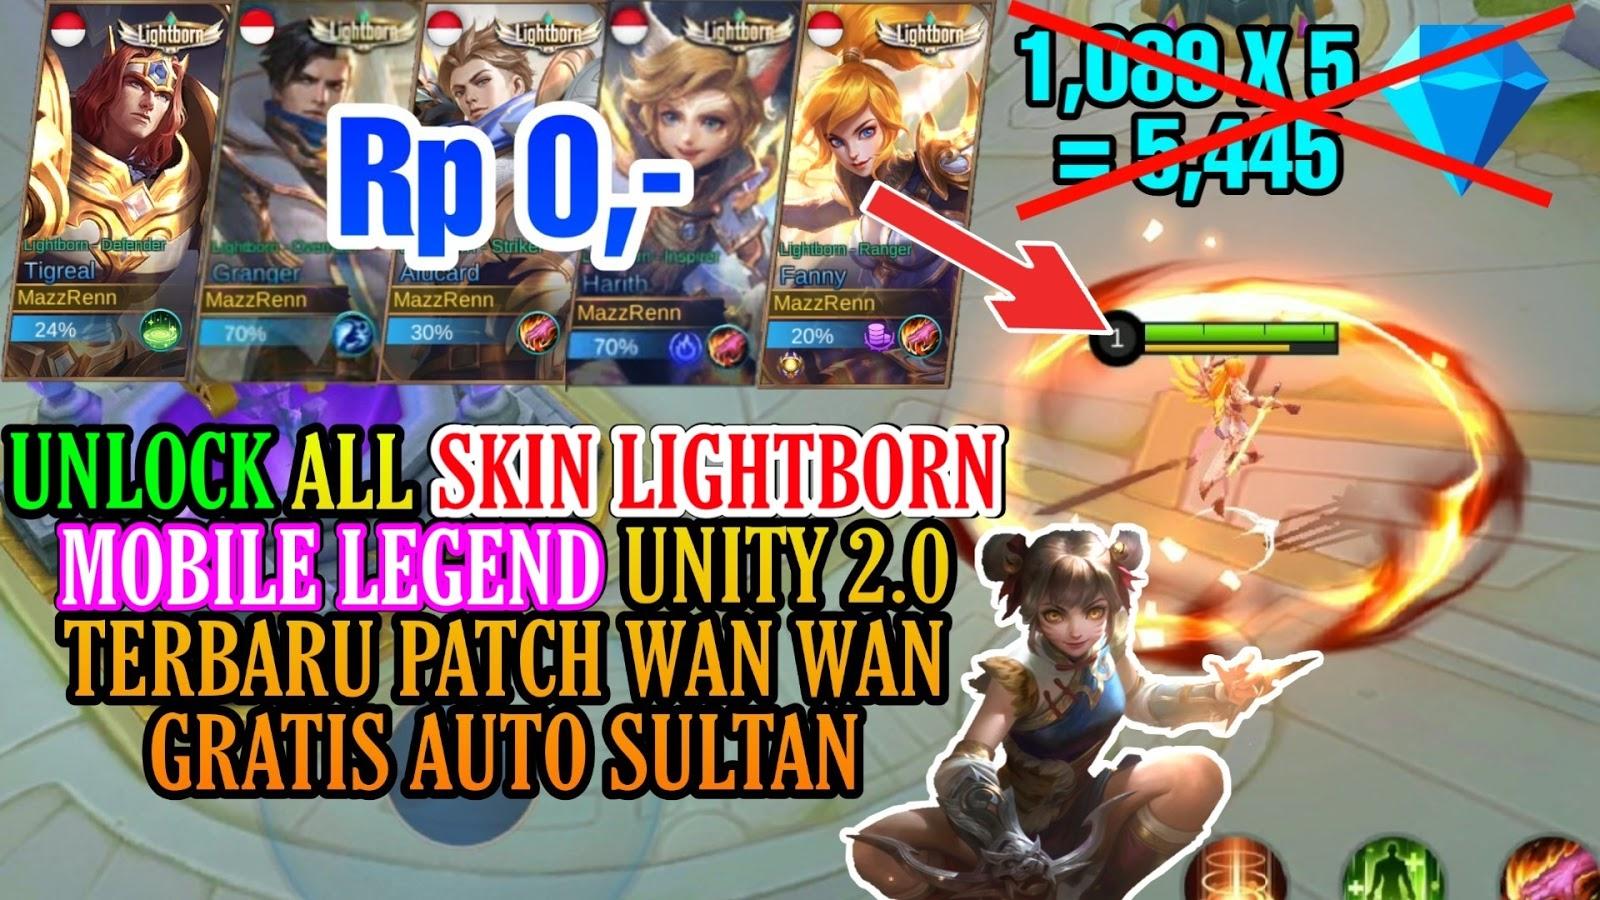 Skin Lightborn Gratis Mobile Legends Permanent Cara